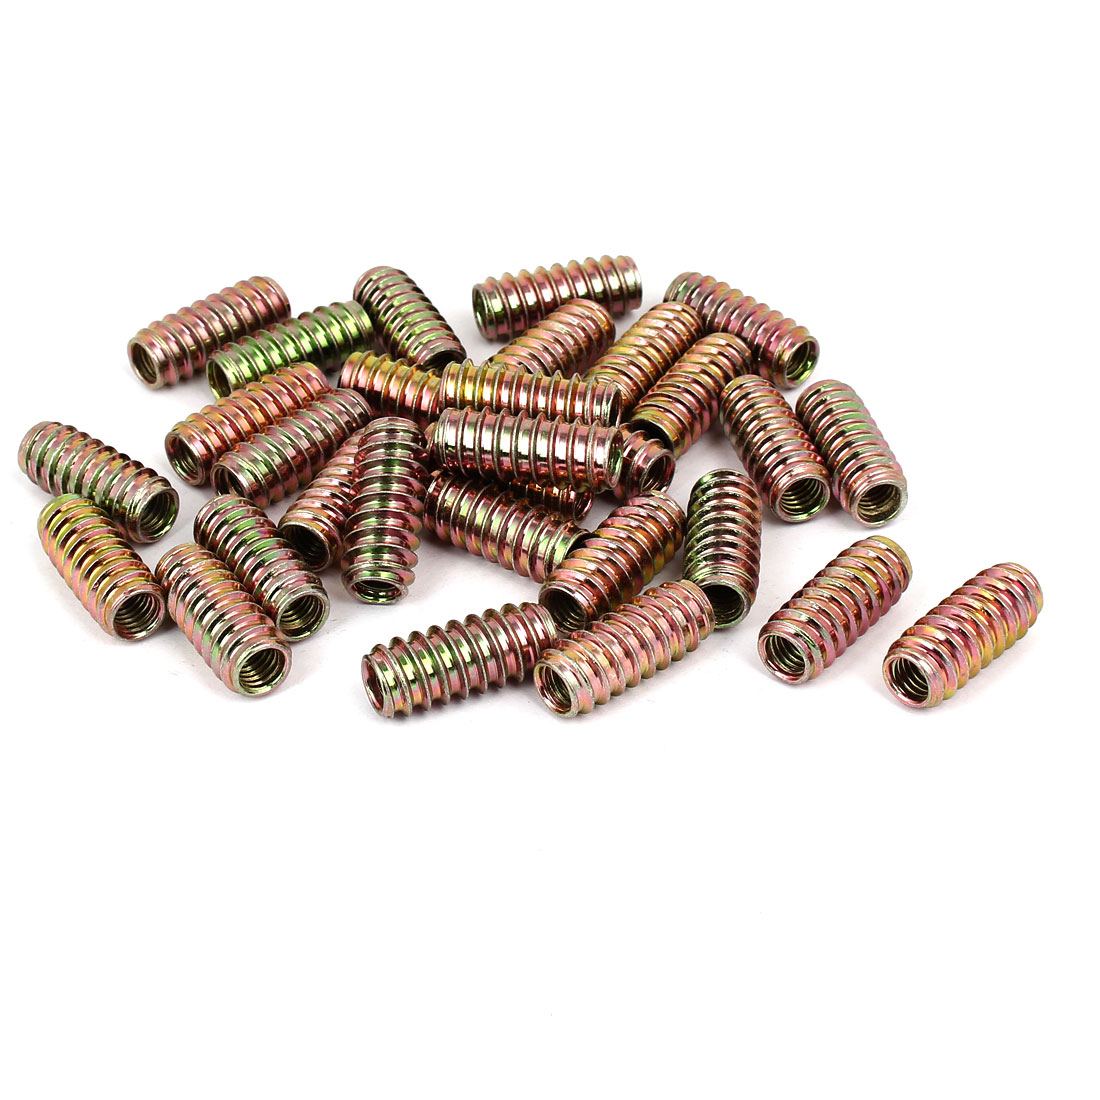 8mm x 30mm Yellow Zinc Plated E-Nut Wood Furniture Insert Nut 30PCS